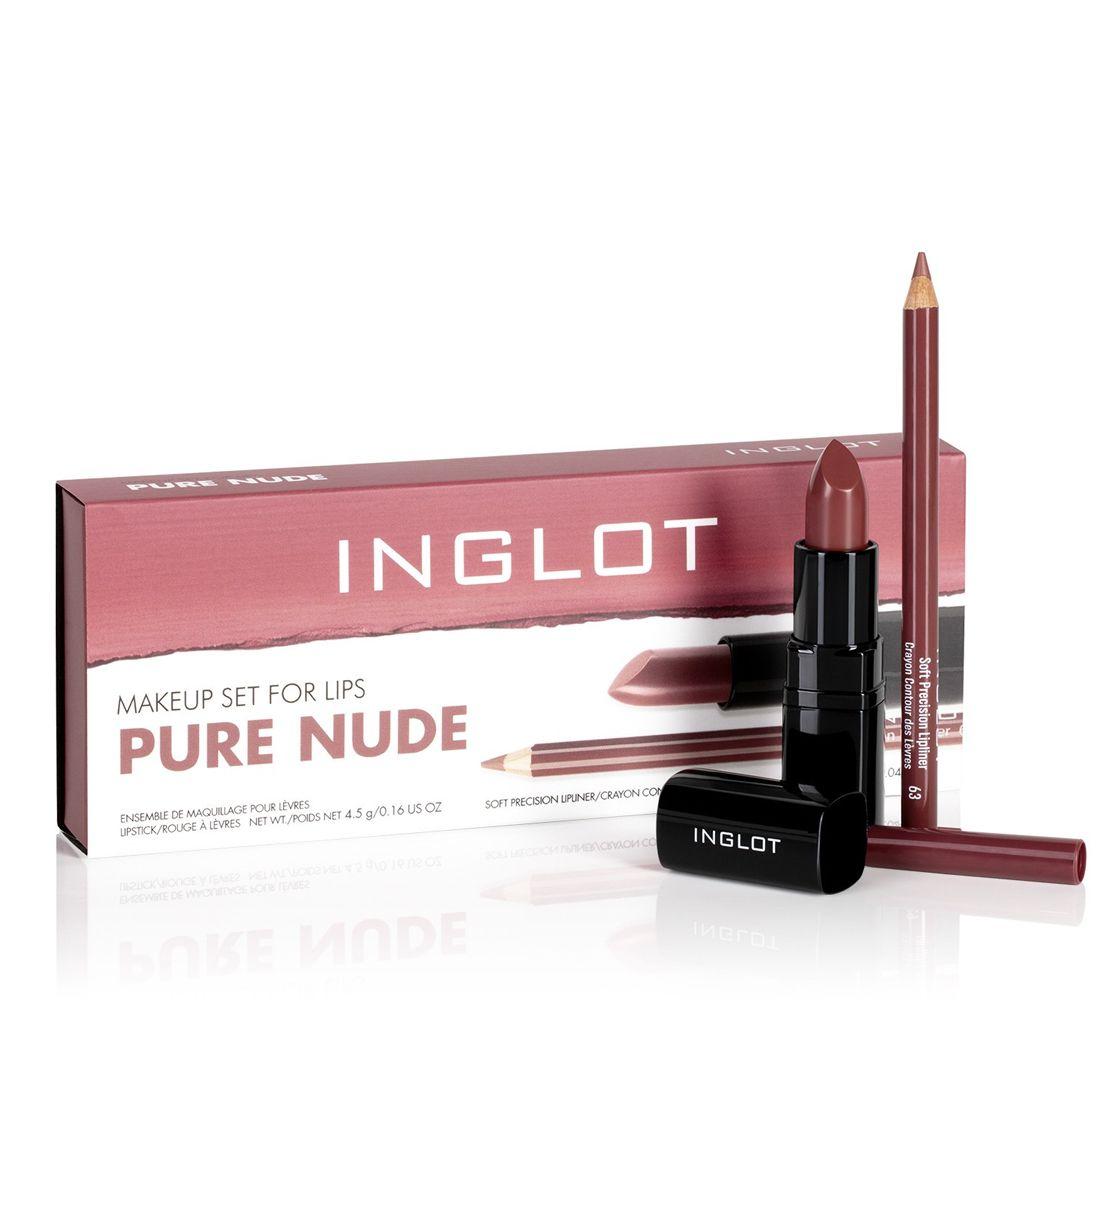 Inglot Makeup Set for Lips - Pure Nude